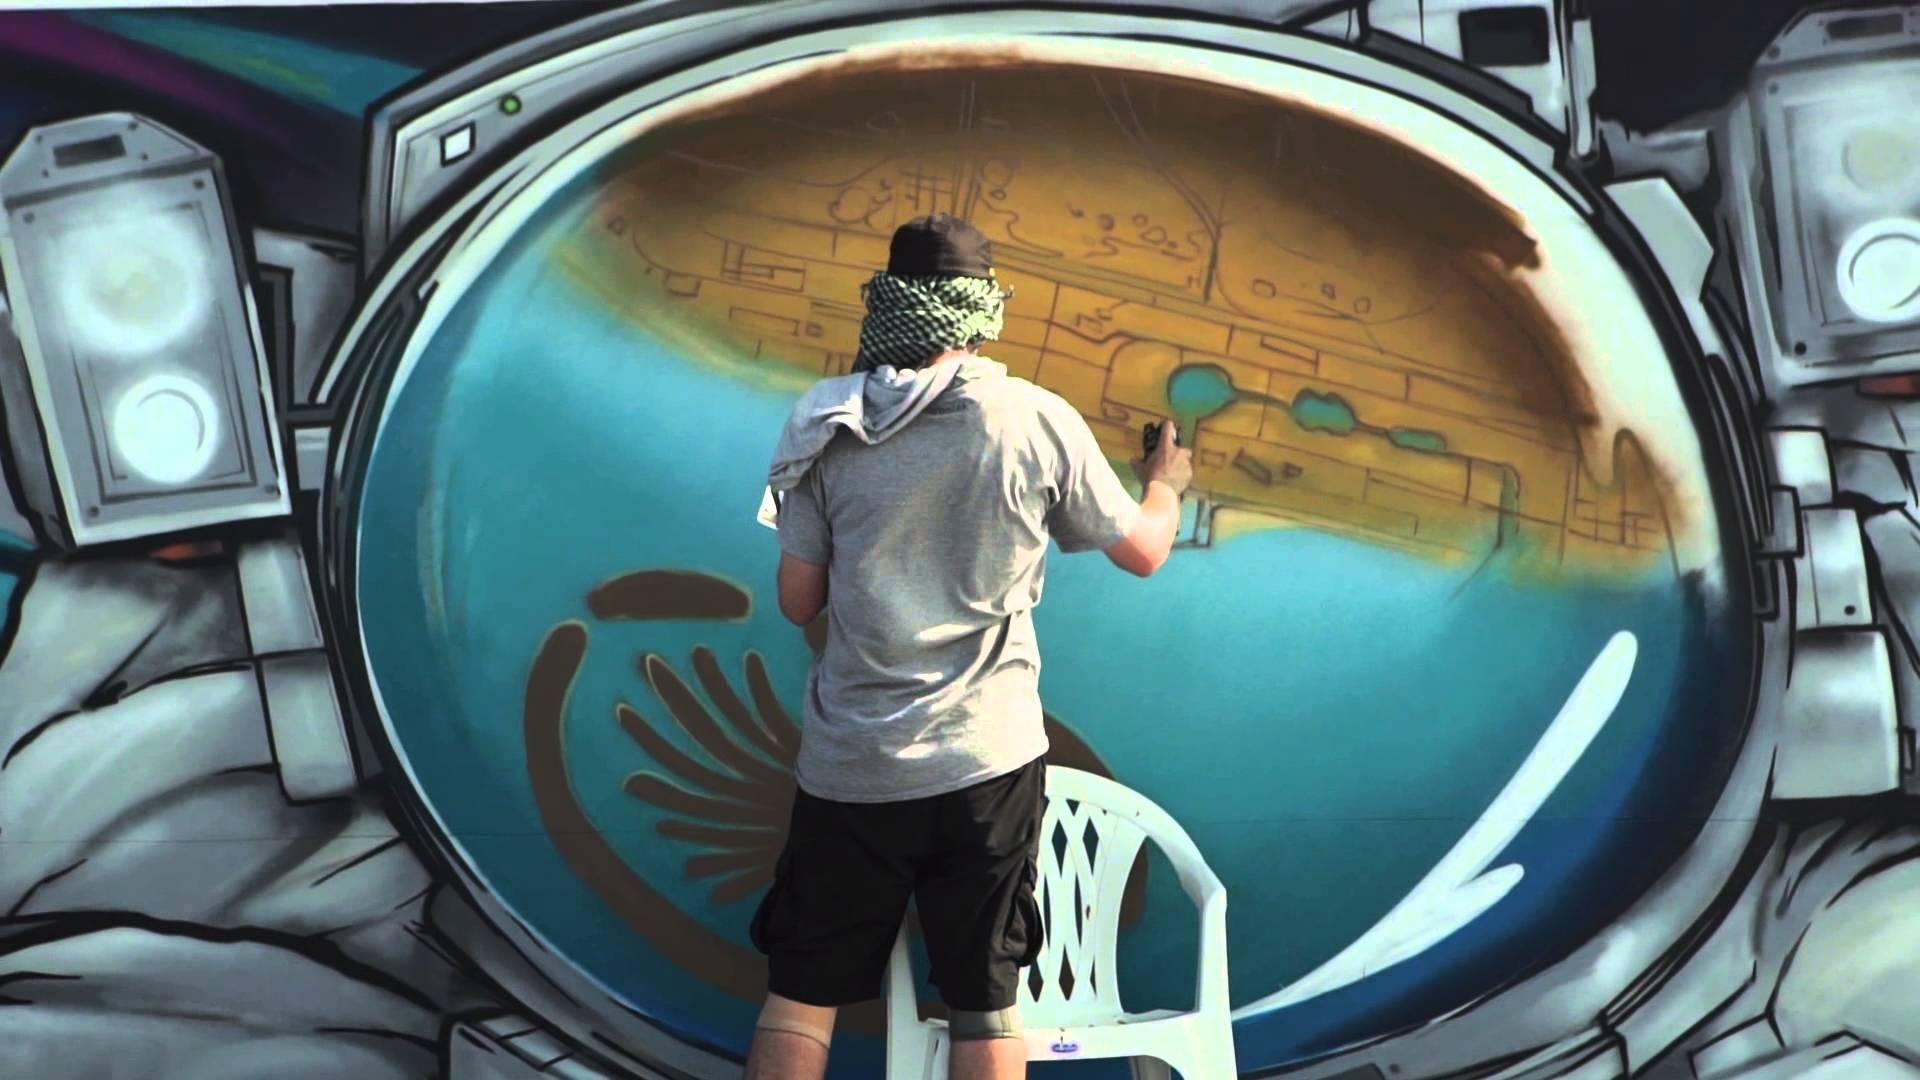 SOFLES, EWOK, BATES, DOES, & More in Dubai #Graffiti